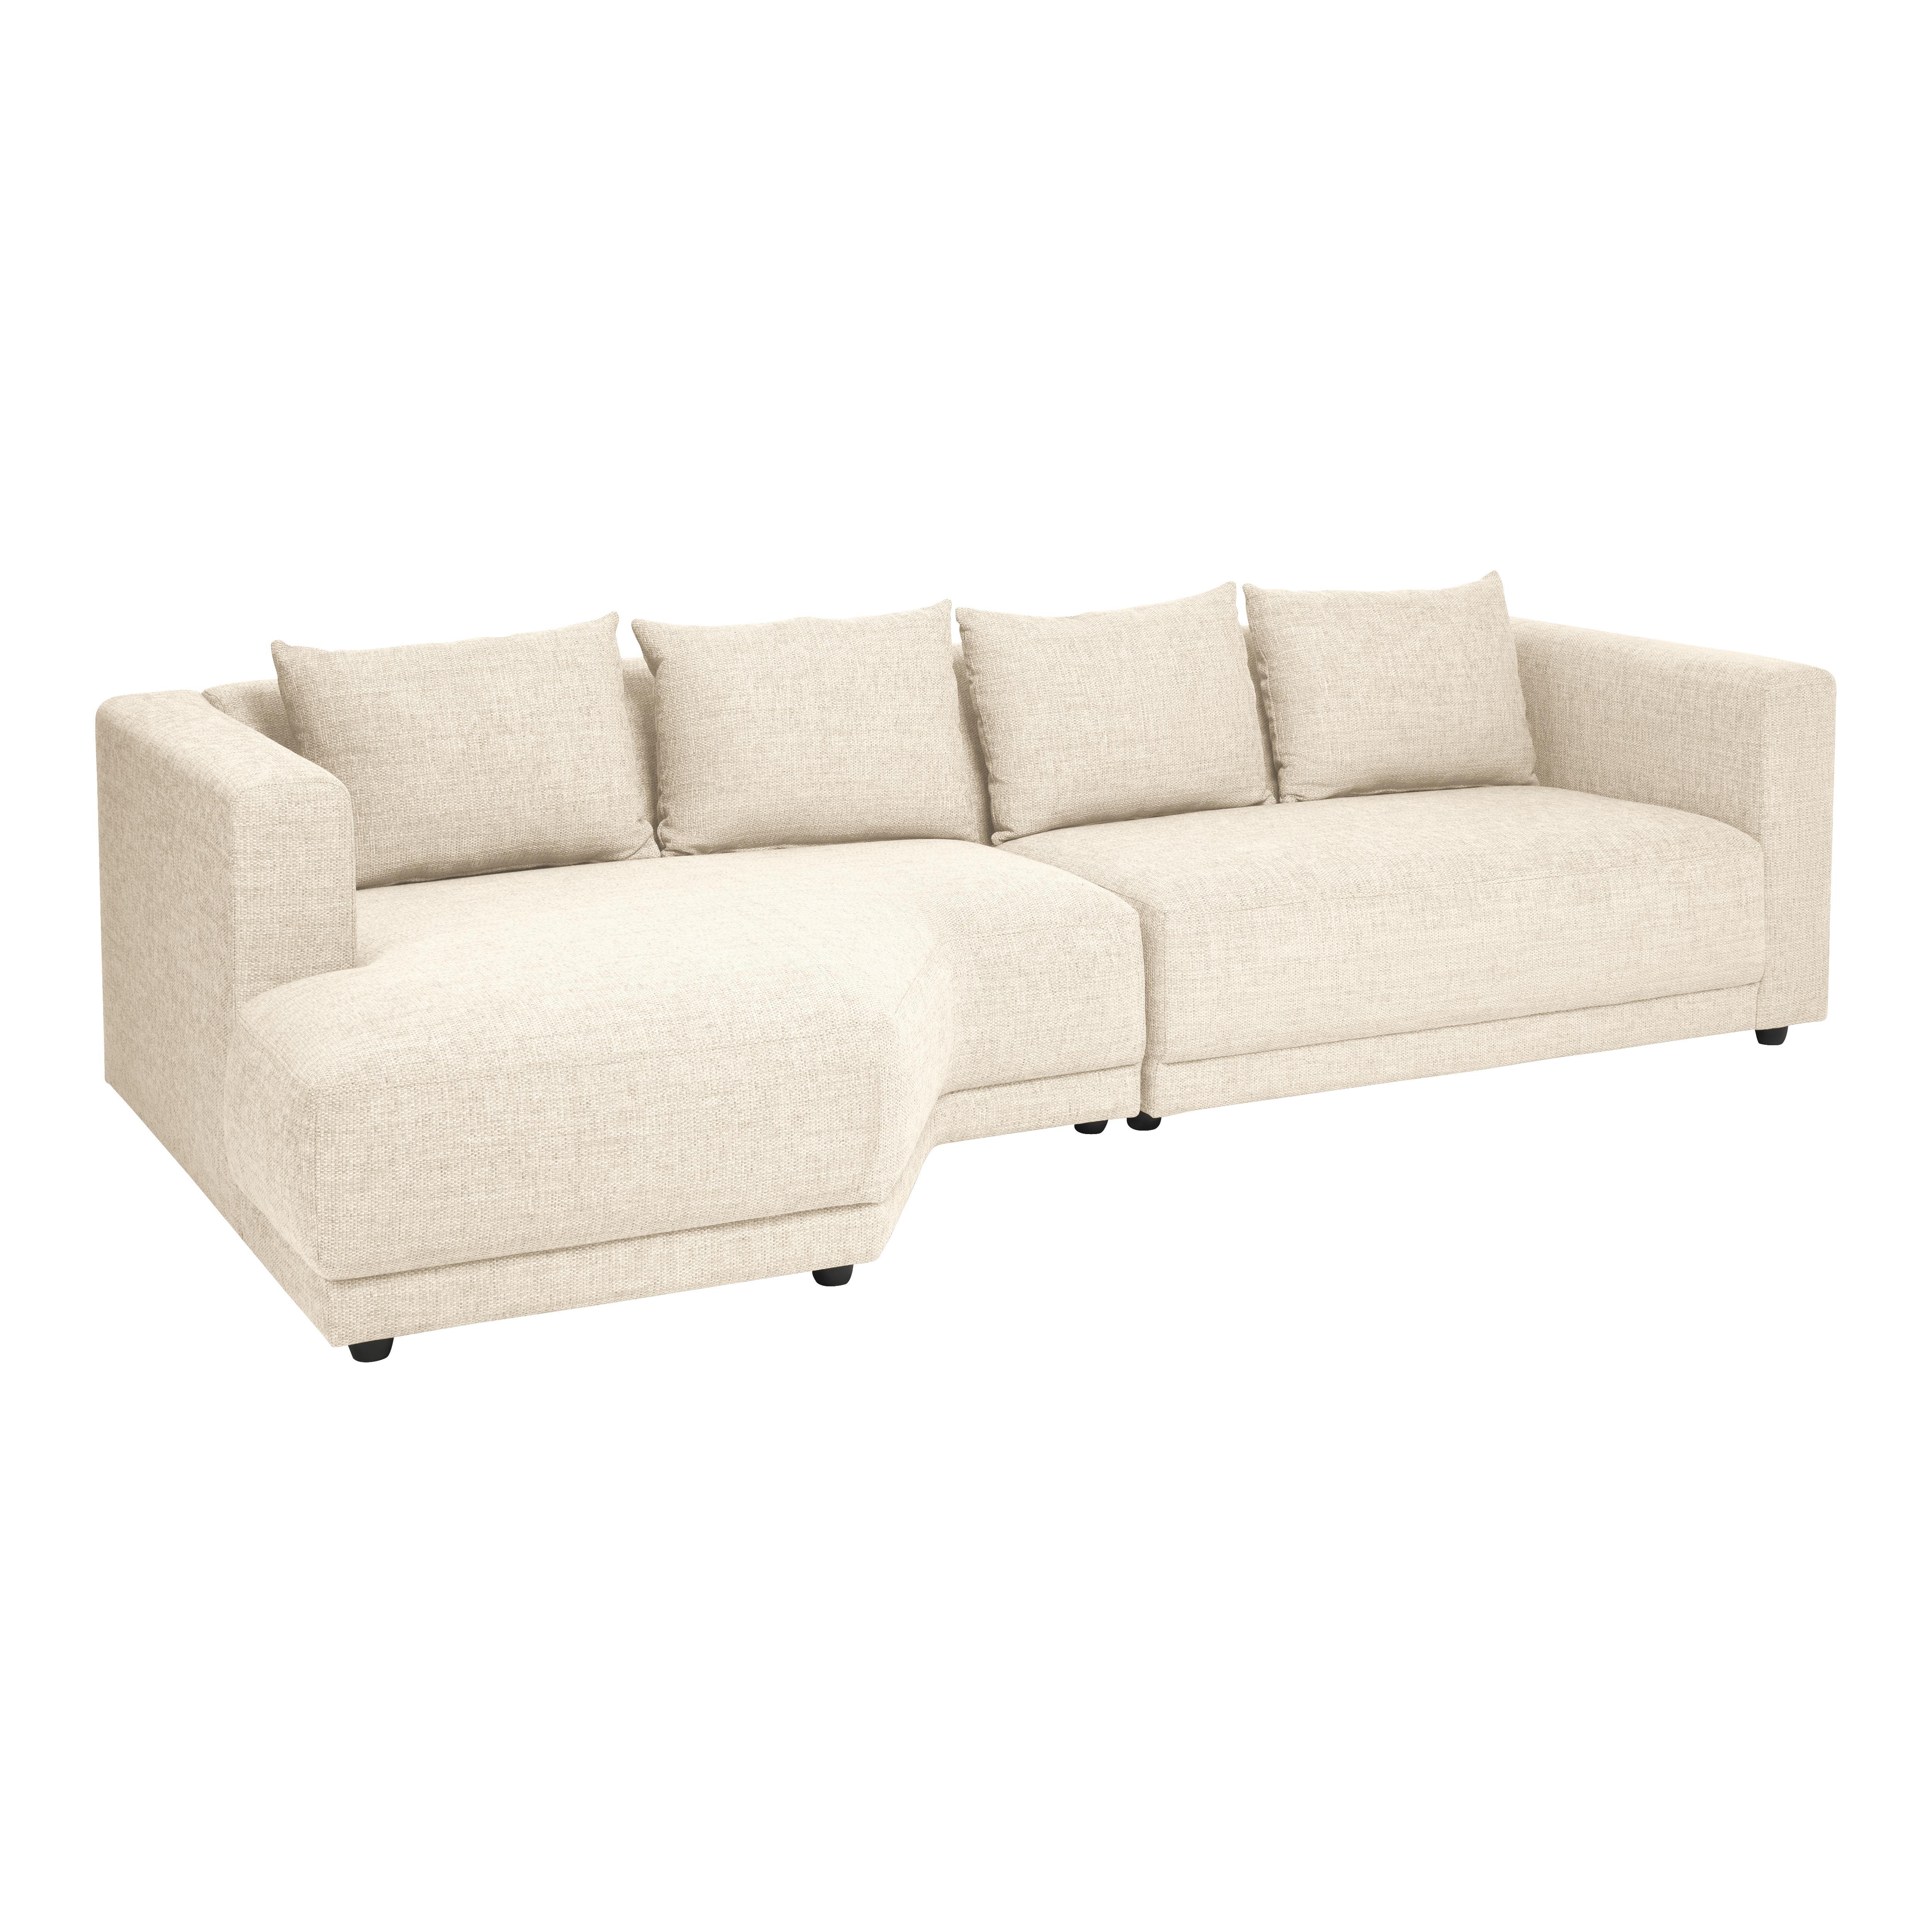 Trevi left corner chaise callida fabric ivory